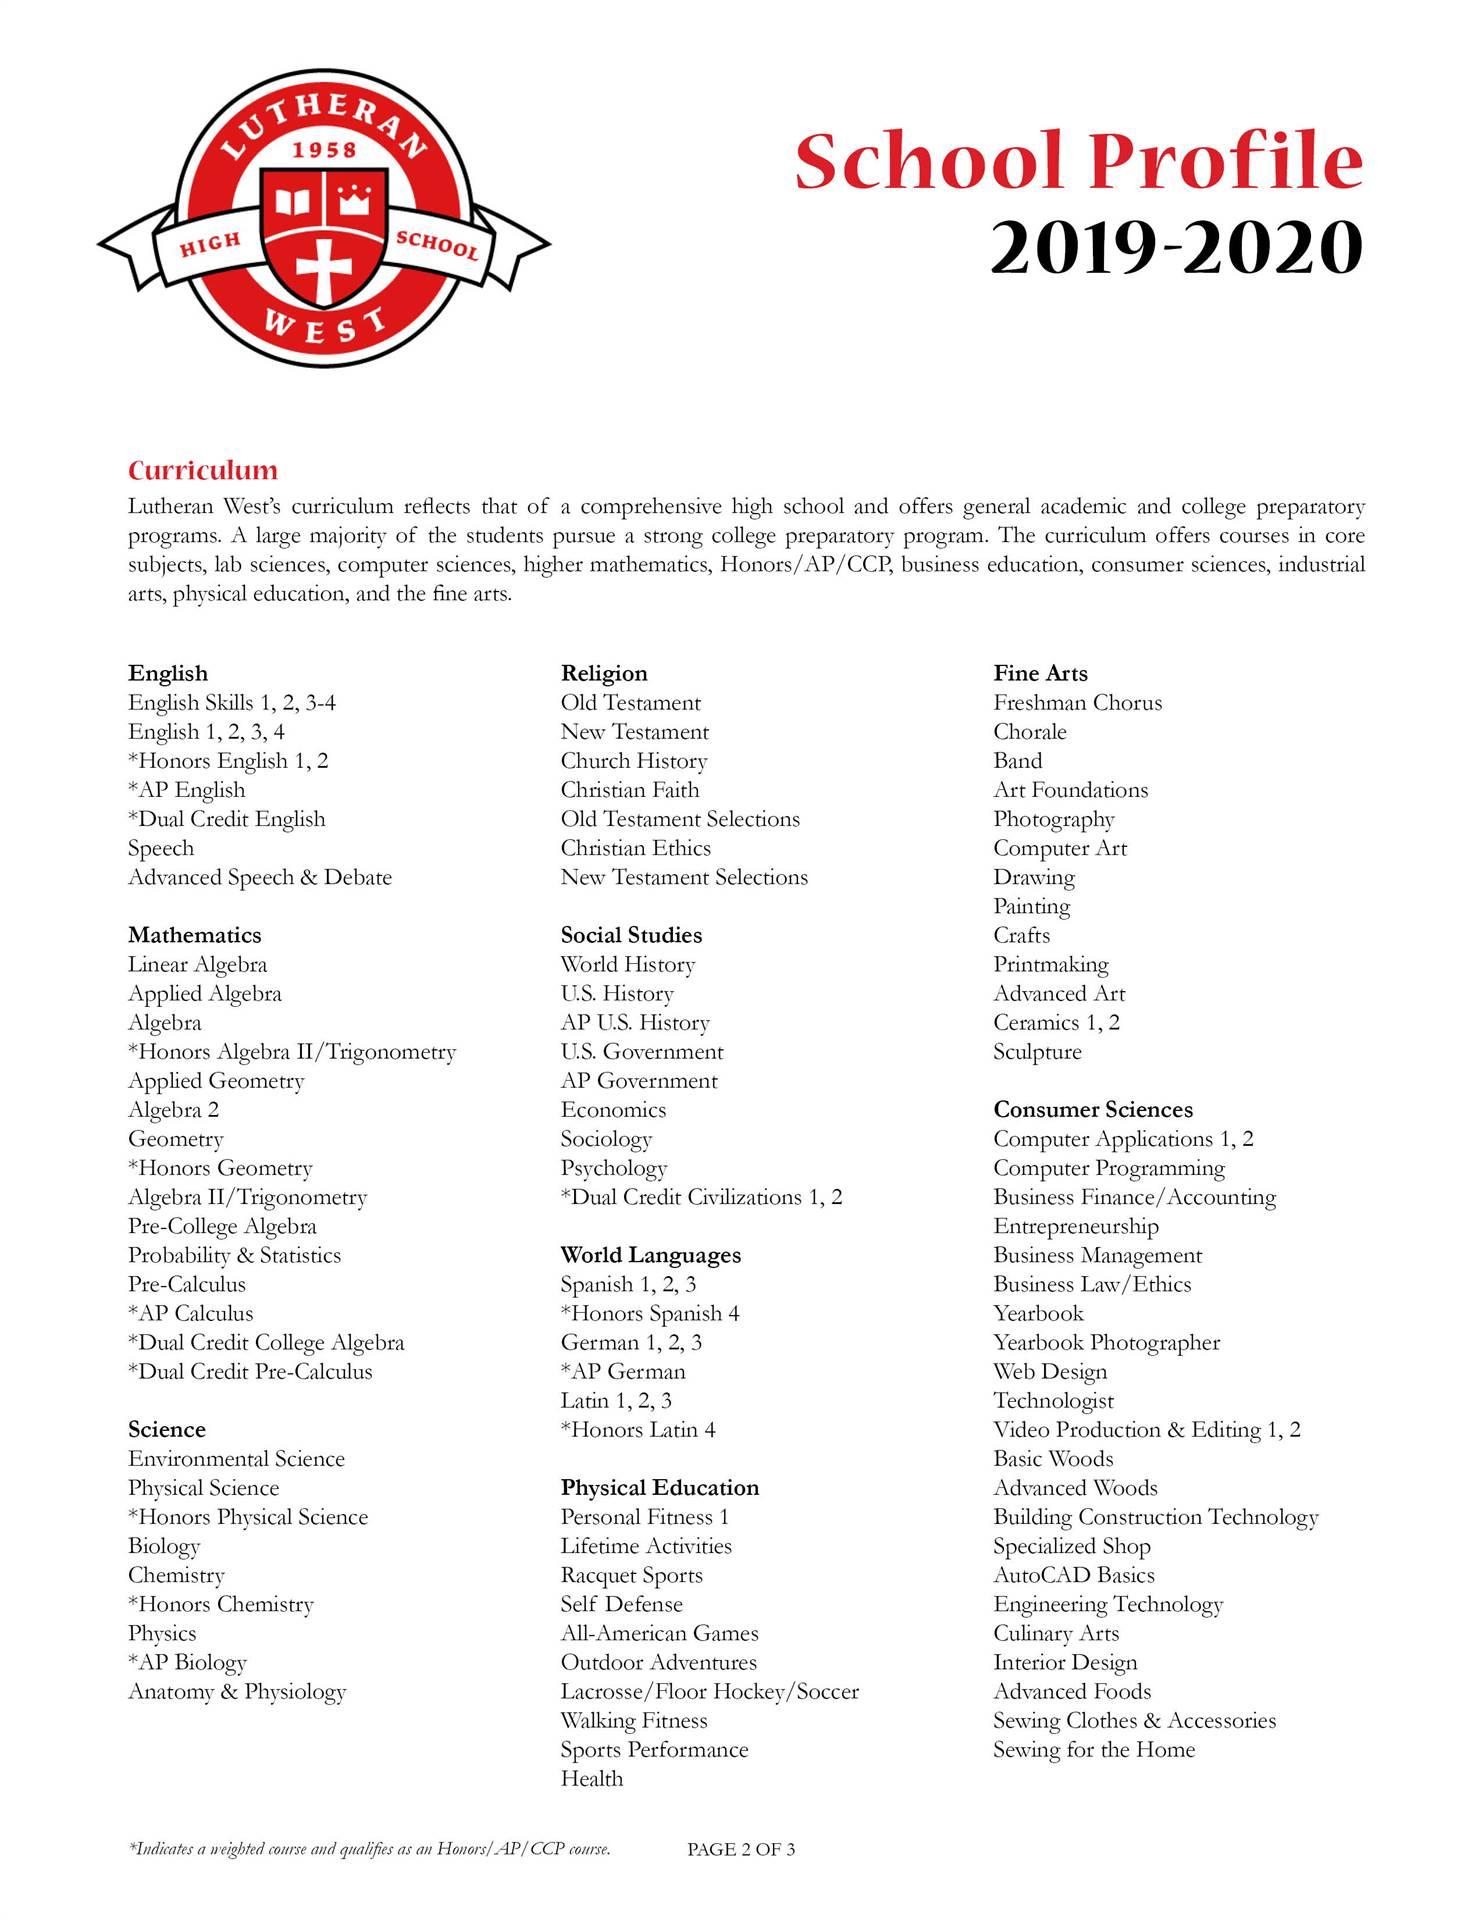 School-Profile-Page2